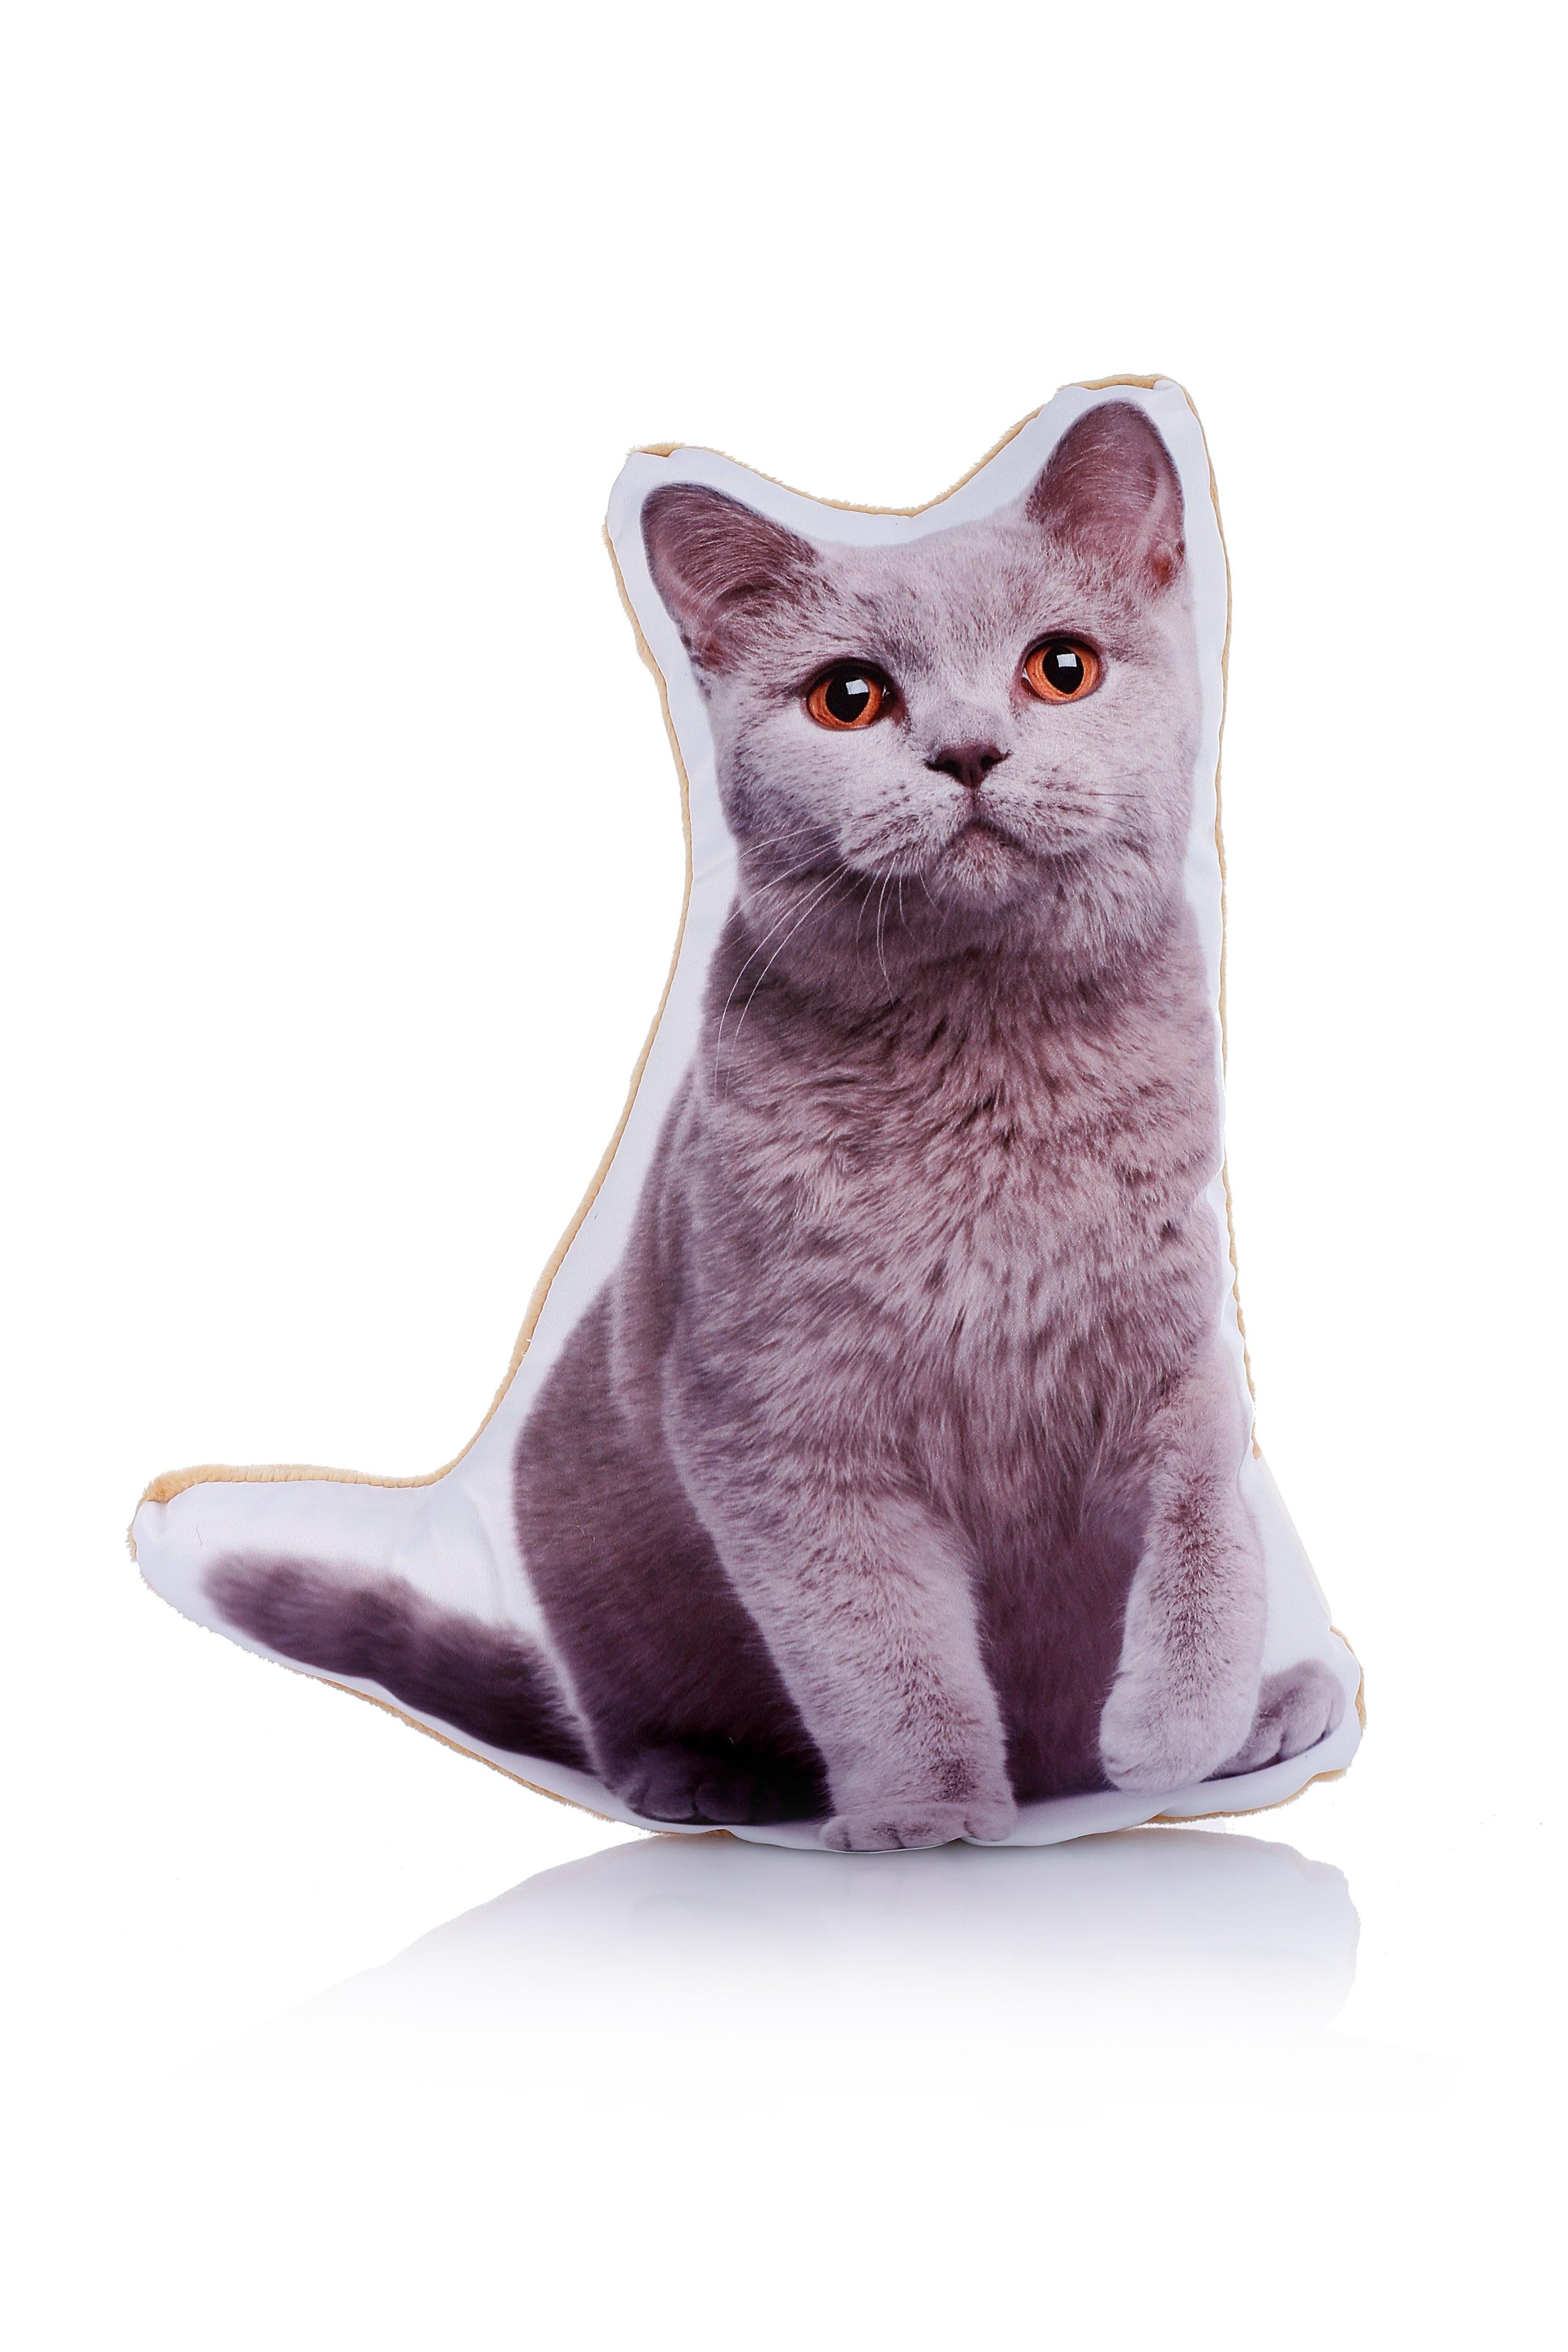 Adorable british blue cat shaped midi cushion